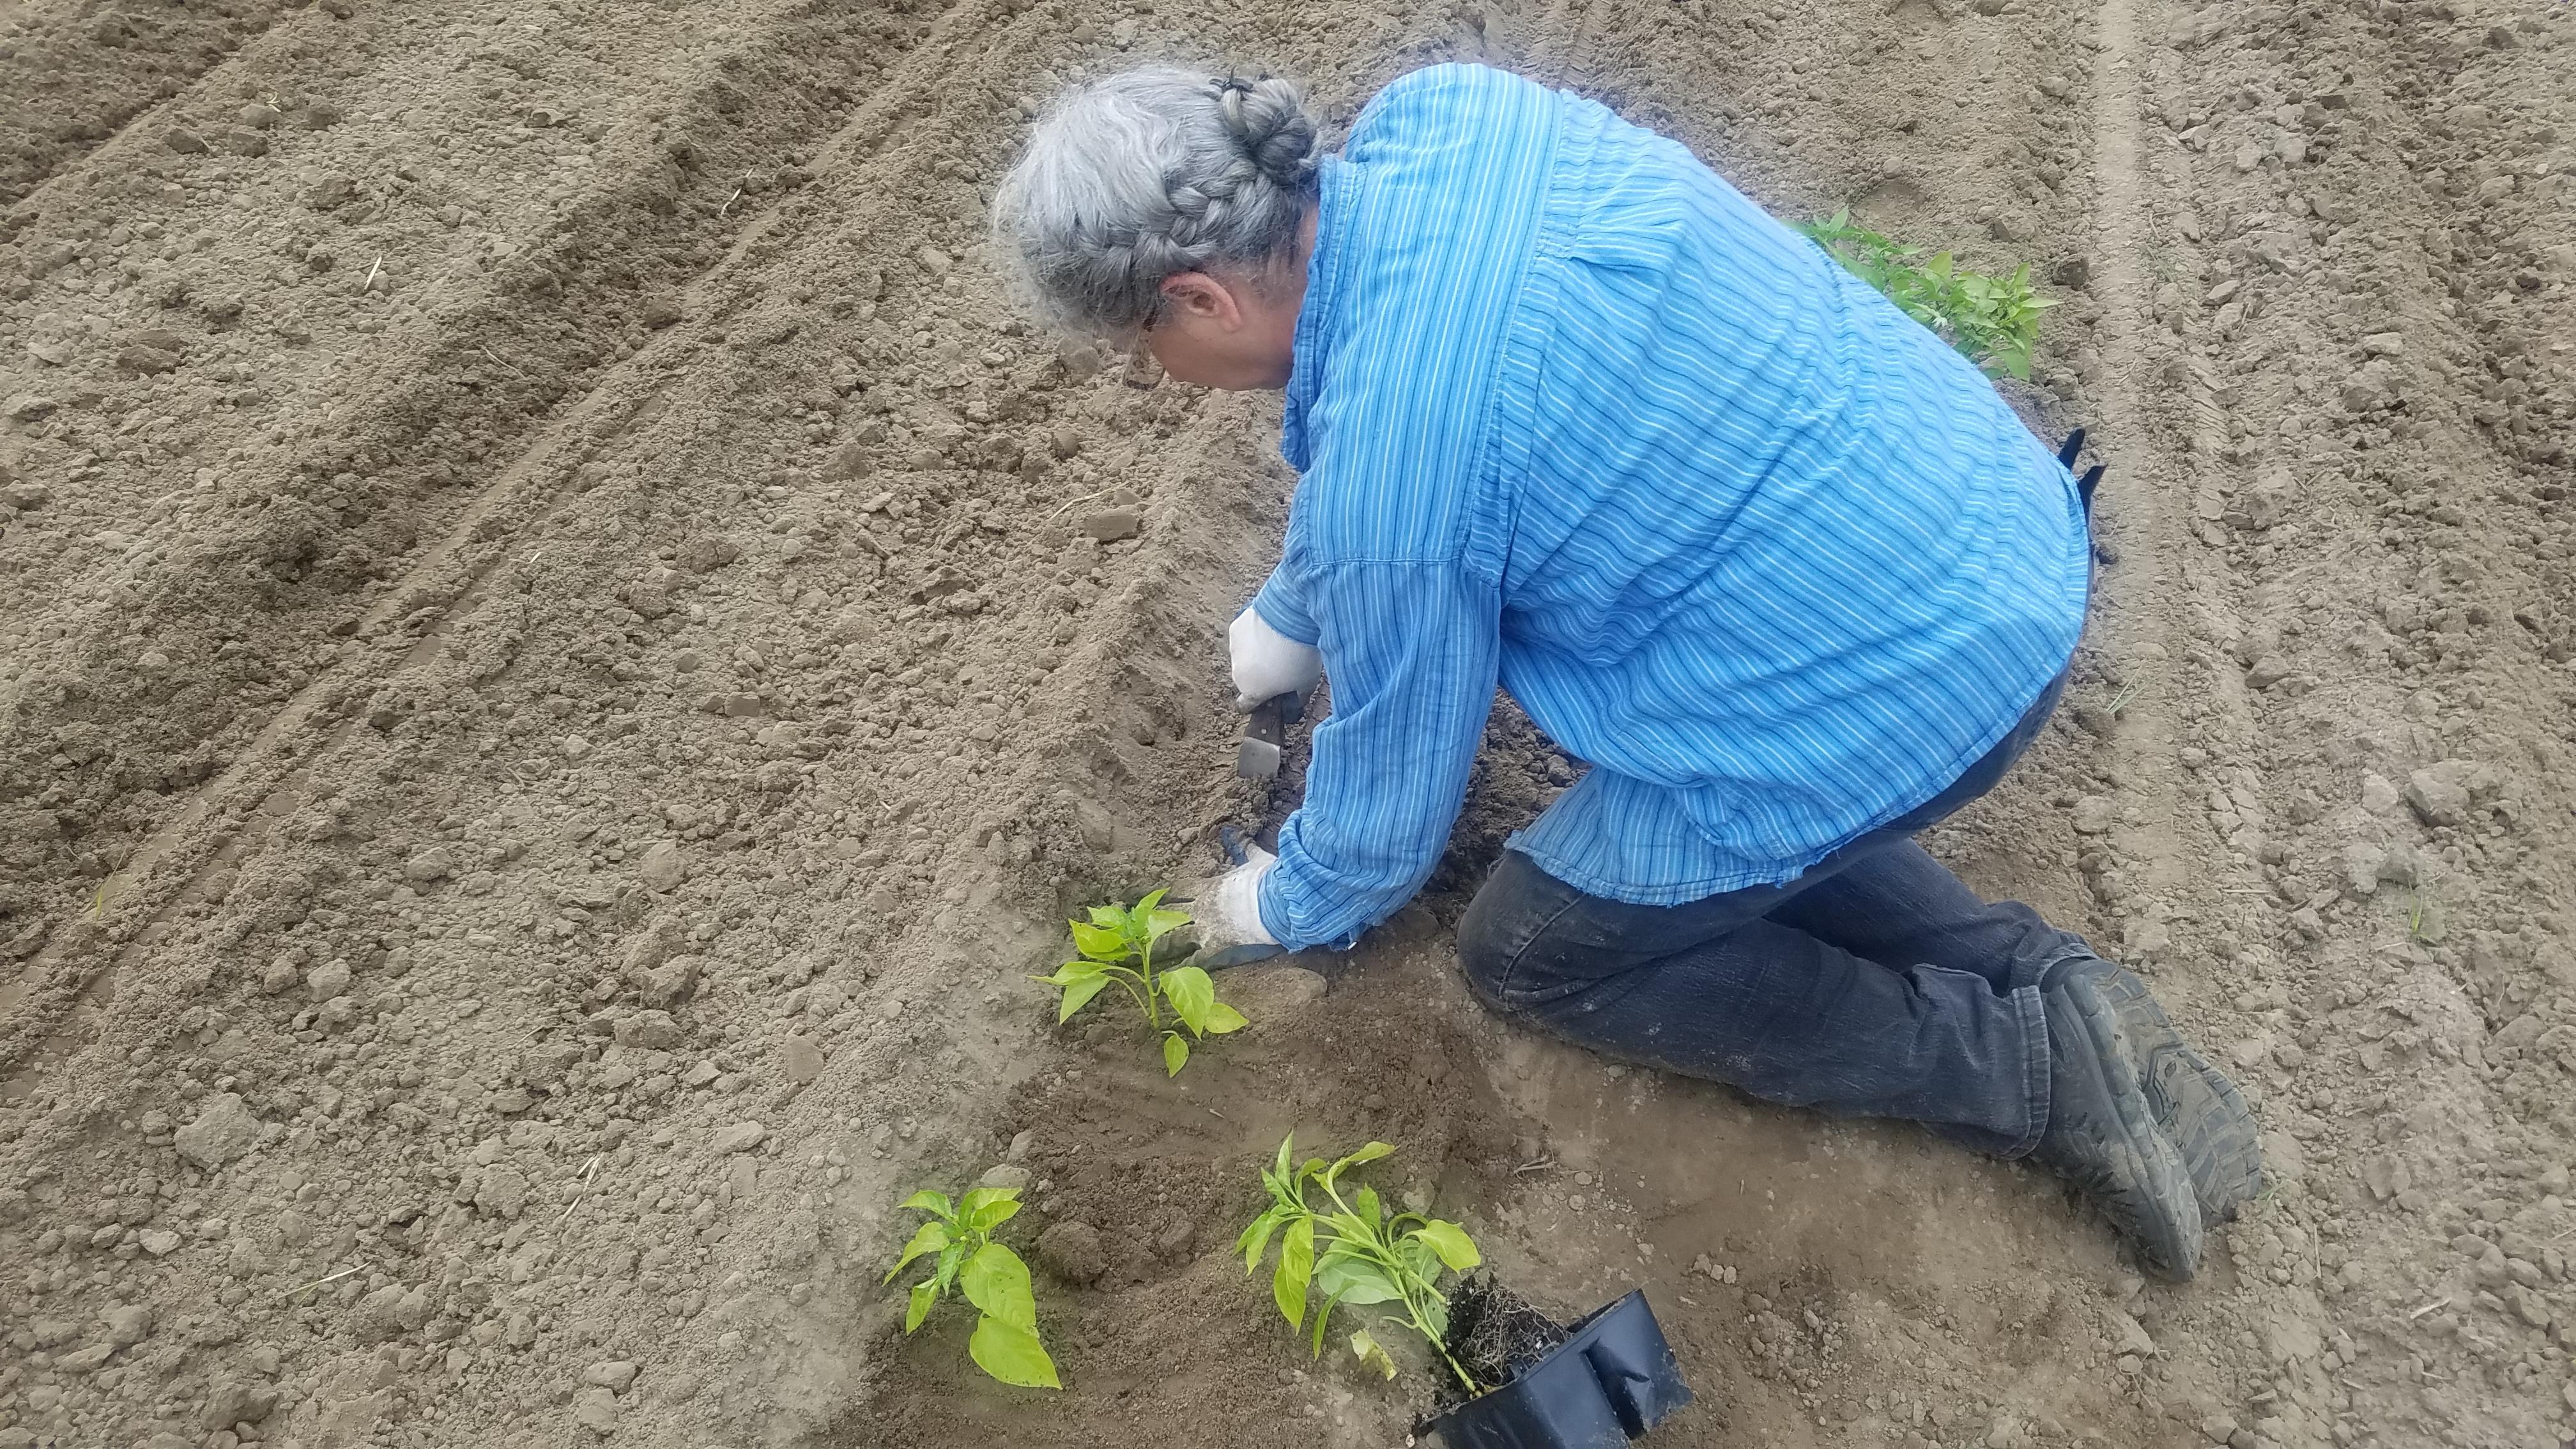 4032x2268 Dig next hole, Planting, in Planting Garden, by John S. Quarterman, for OkraParadise.com, 8 April 2019